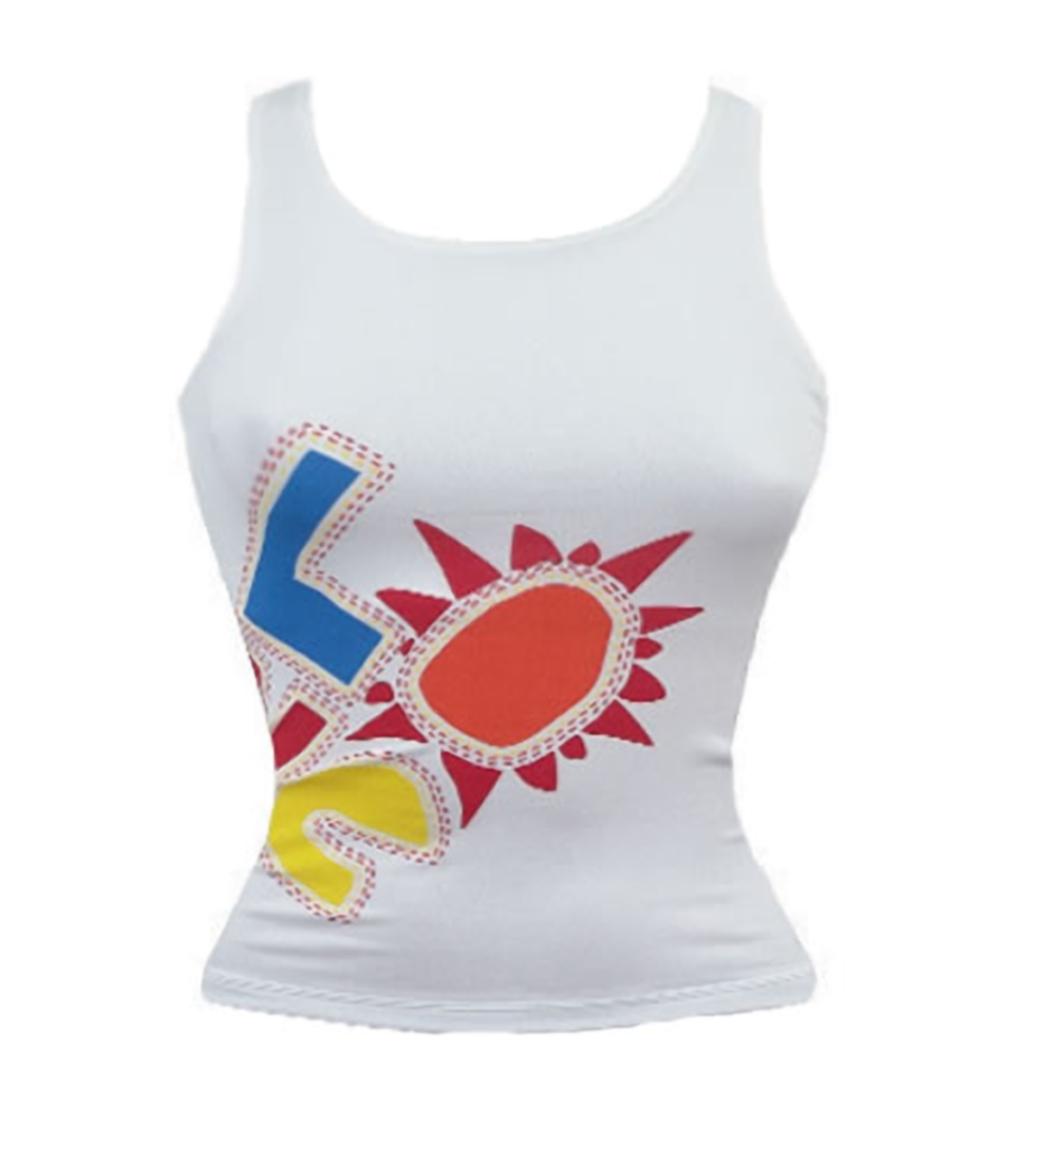 bc5ede99354ac OP Swimwear T Shirt Graphic T-Back Rash Guard at SwimOutlet.com